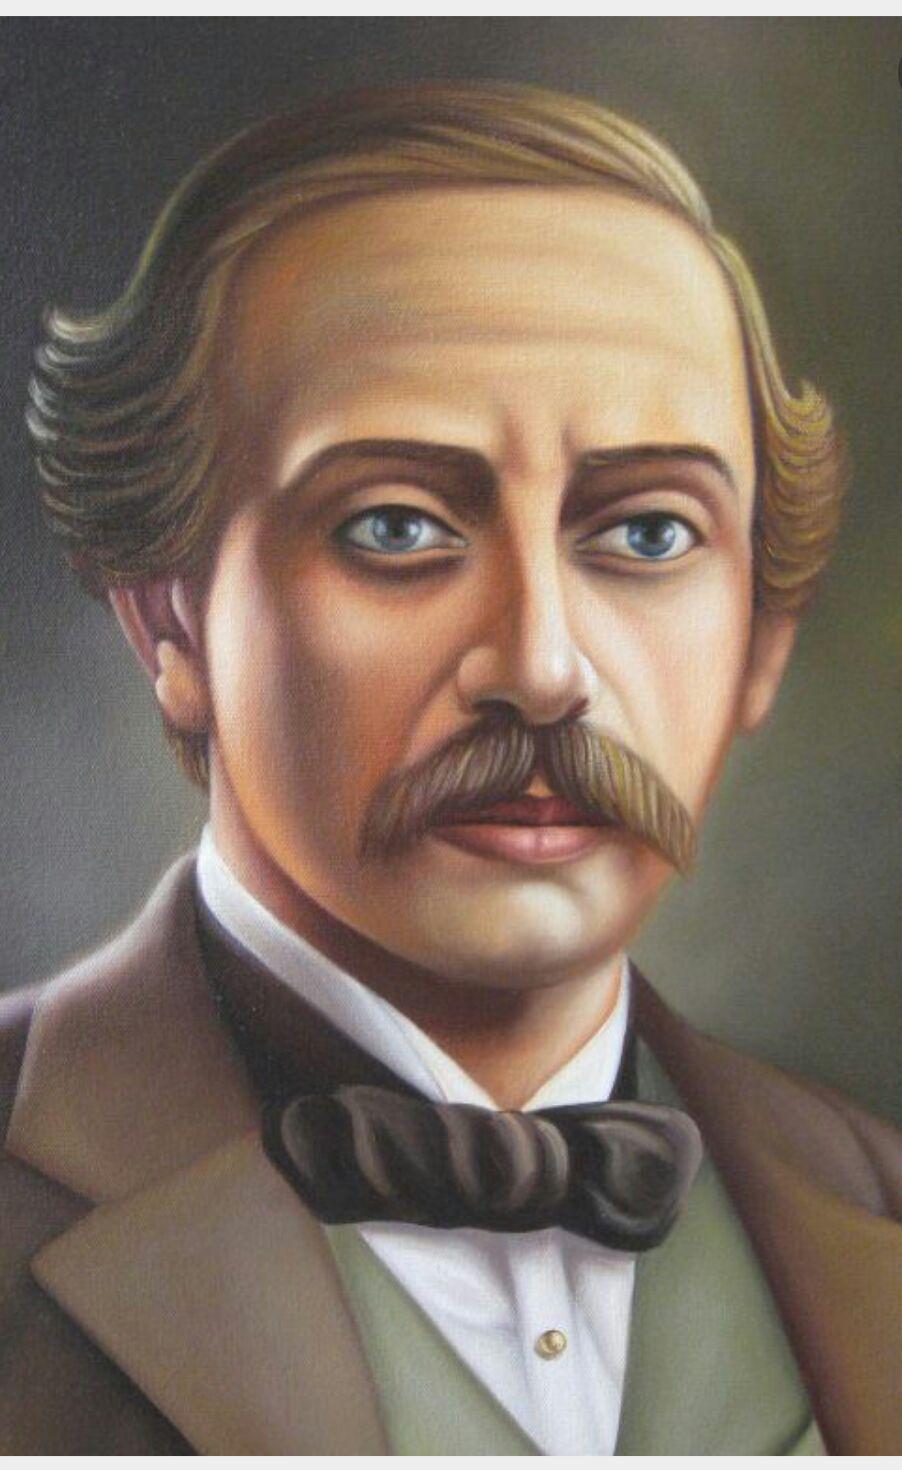 Juan Pablo Duarte - Wikipedia, la enciclopedia libre